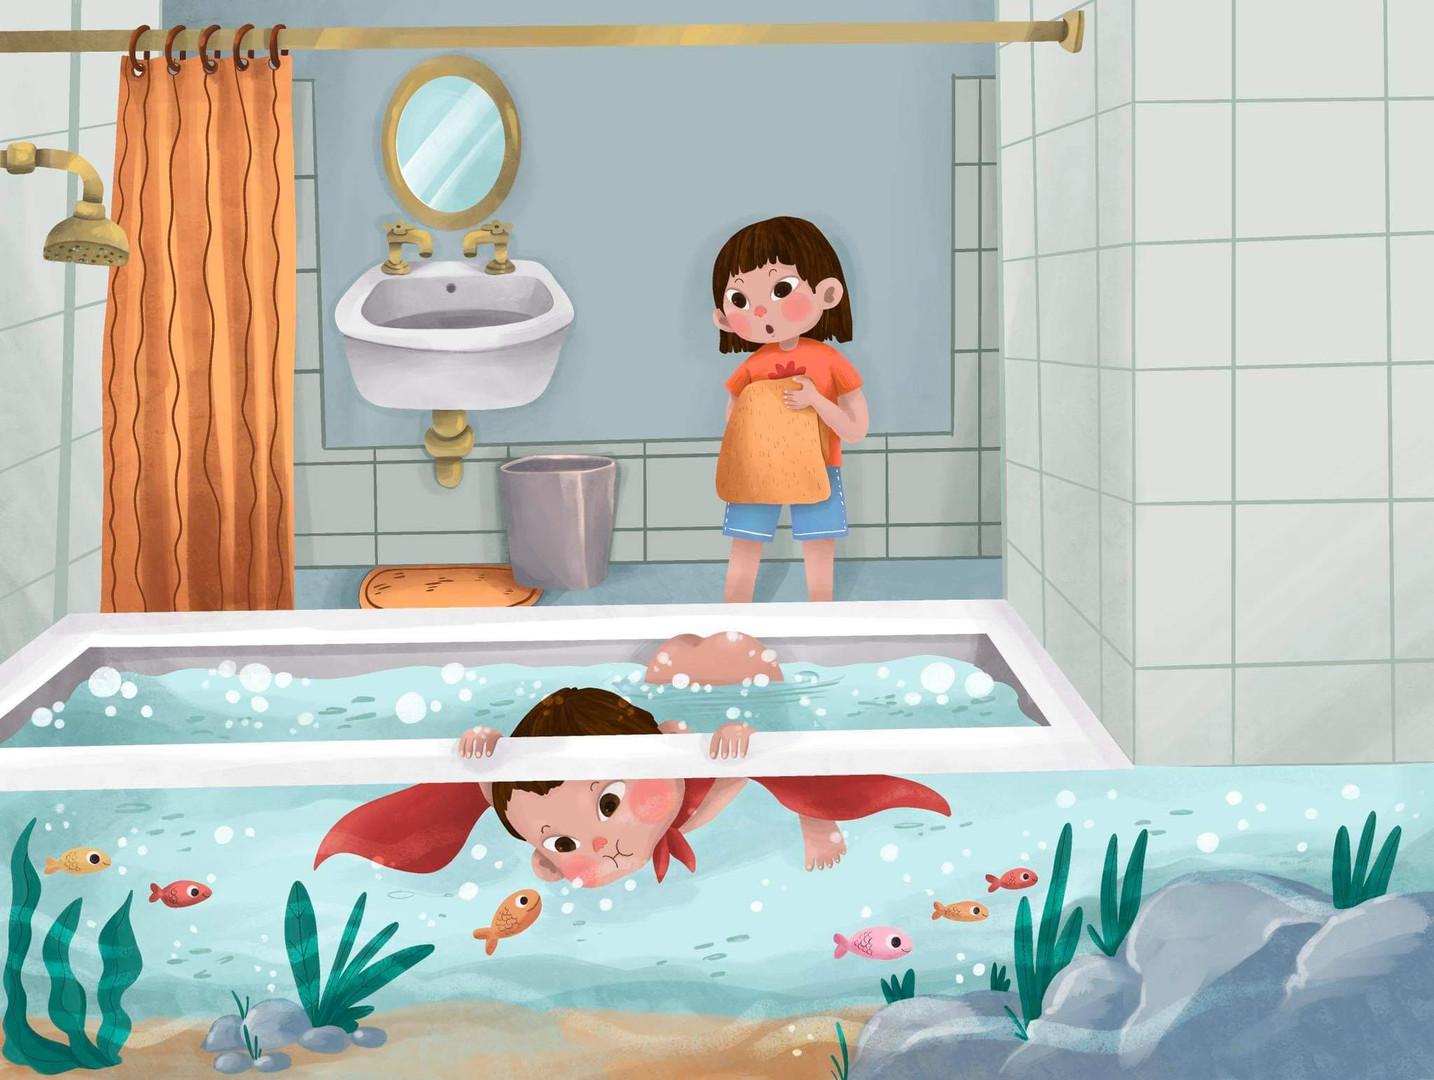 kid in tub.jpeg